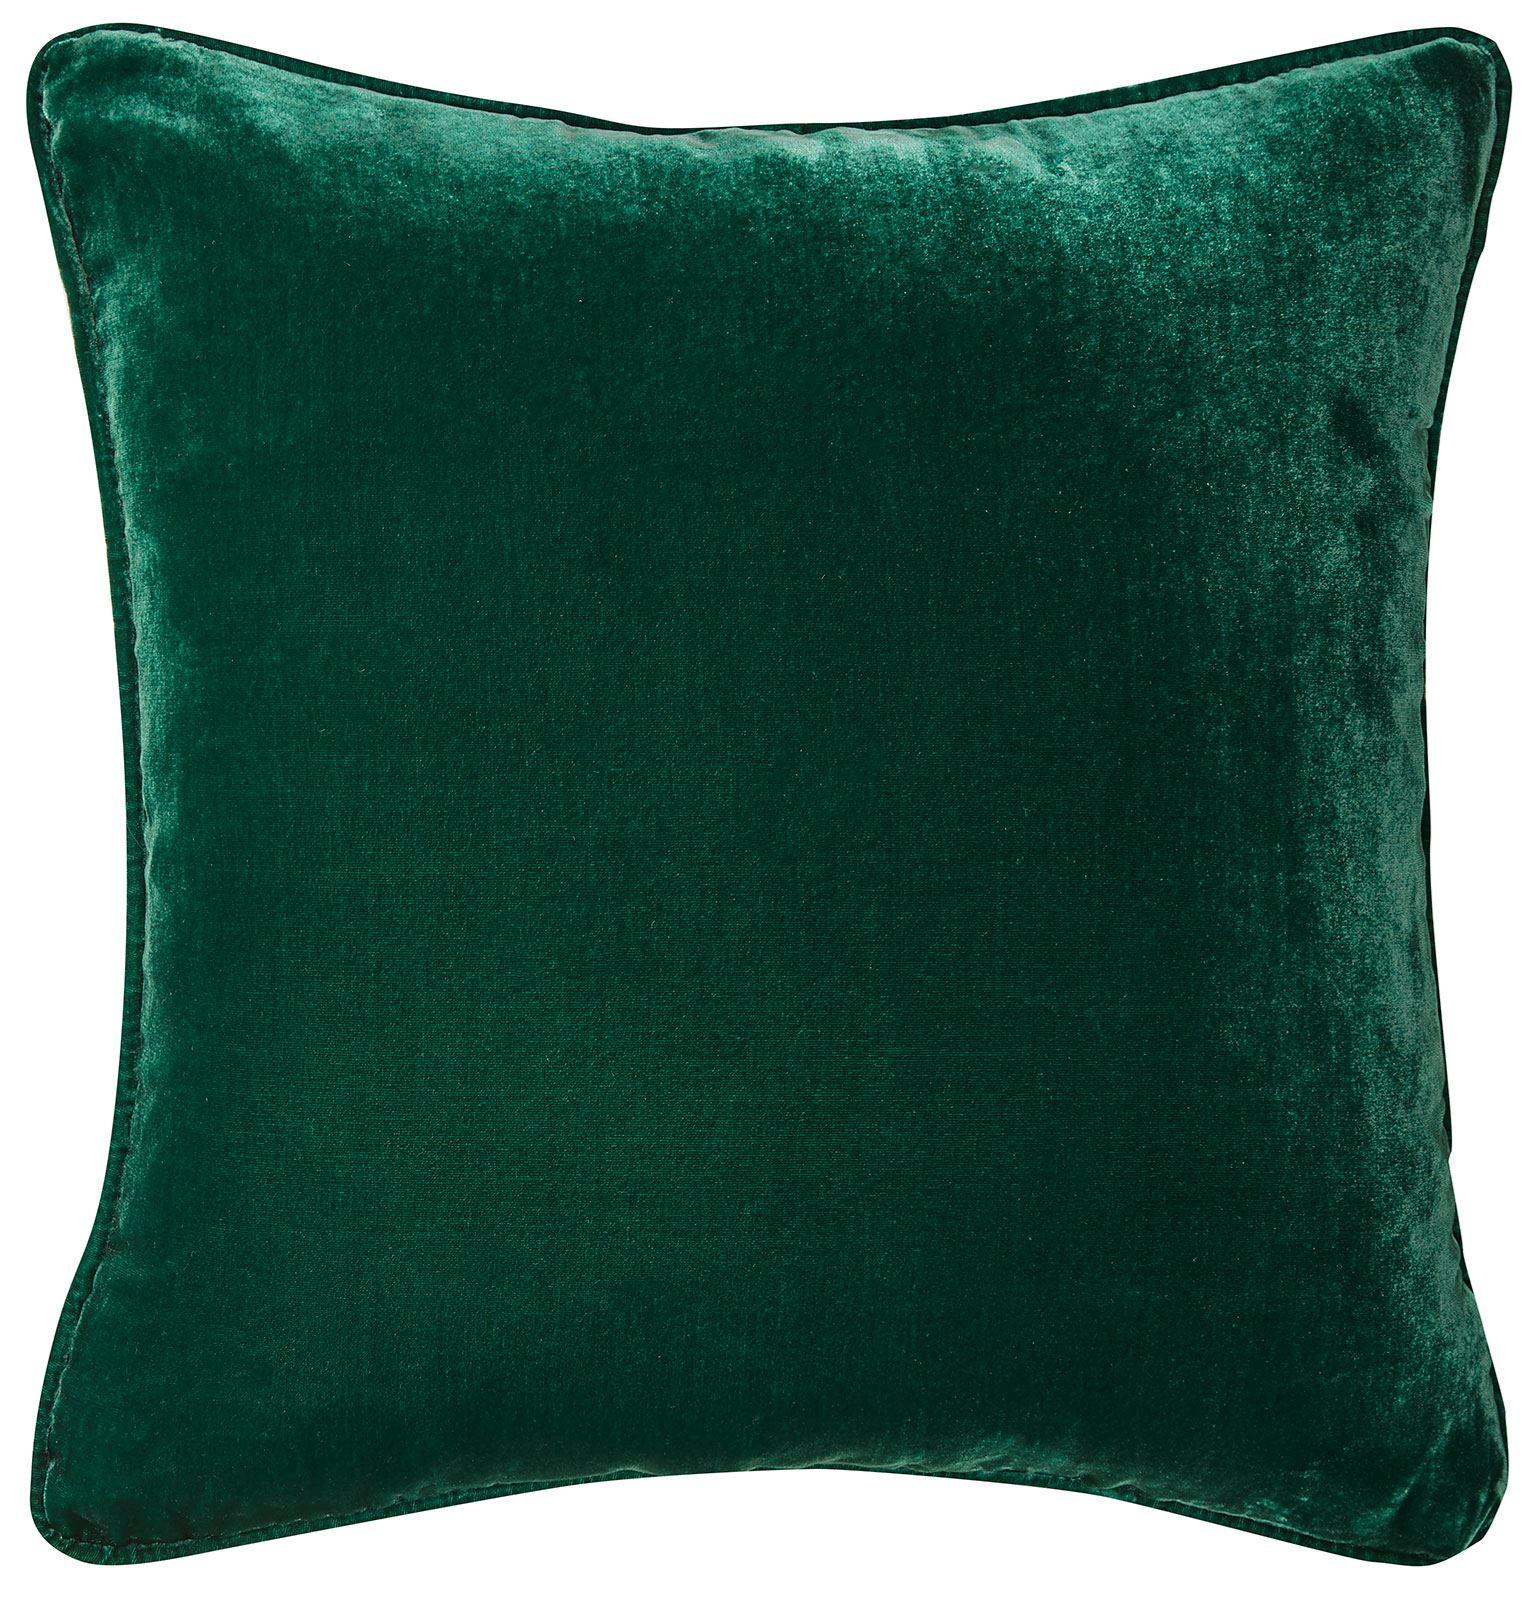 Picture of Silk Velvet Cushion - Emerald